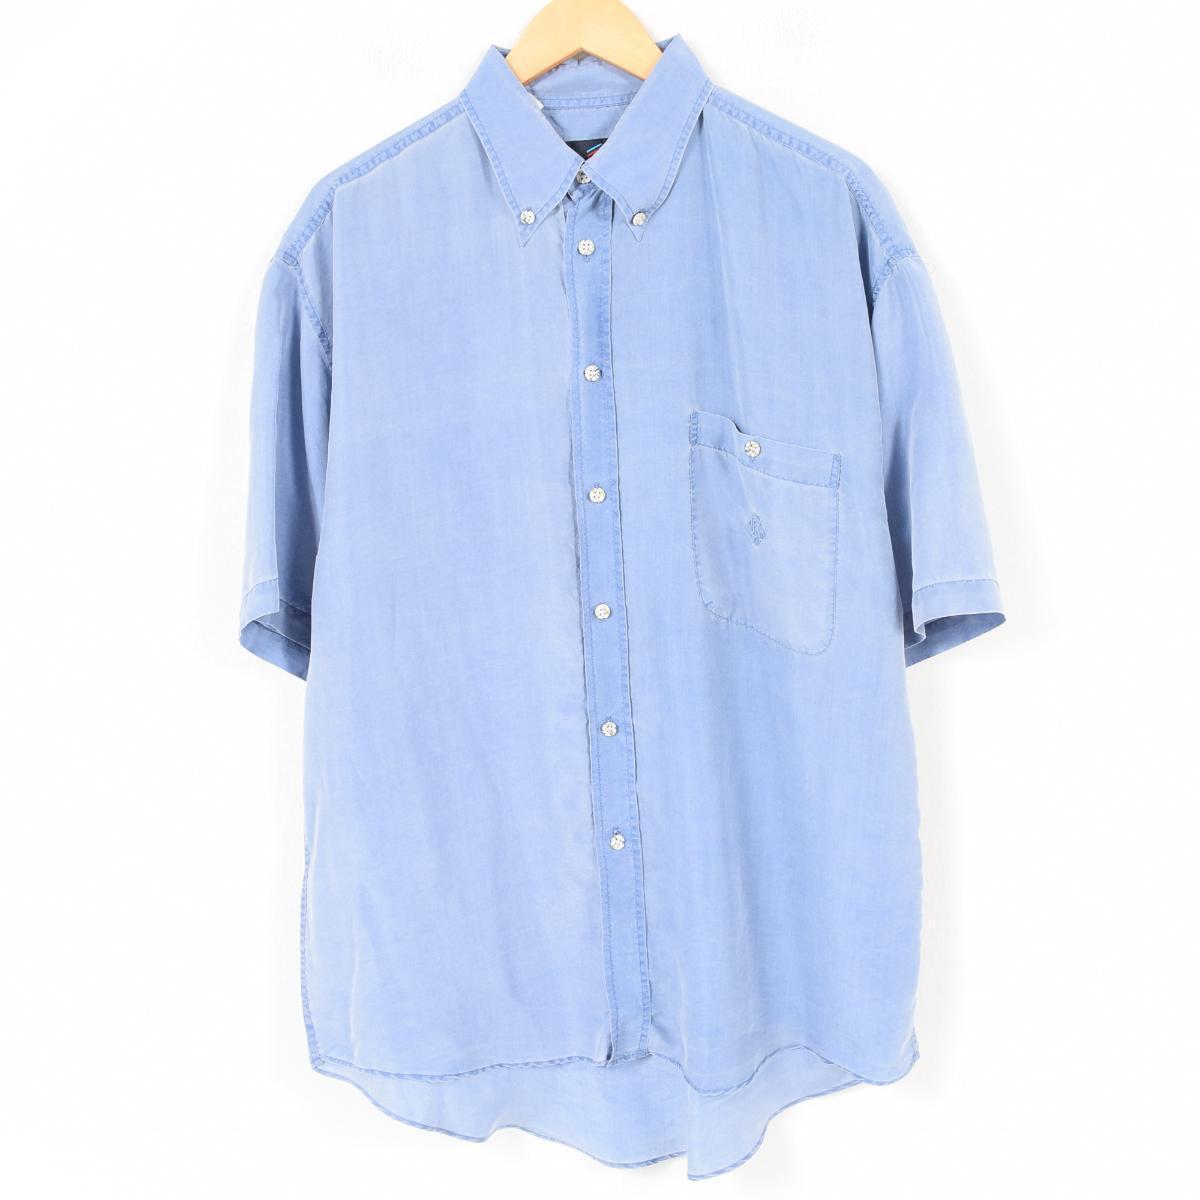 online store 225c4 cbff5 DANIEL HECHTER short-sleeved silk shirt men L /wap0195 who are button-downed